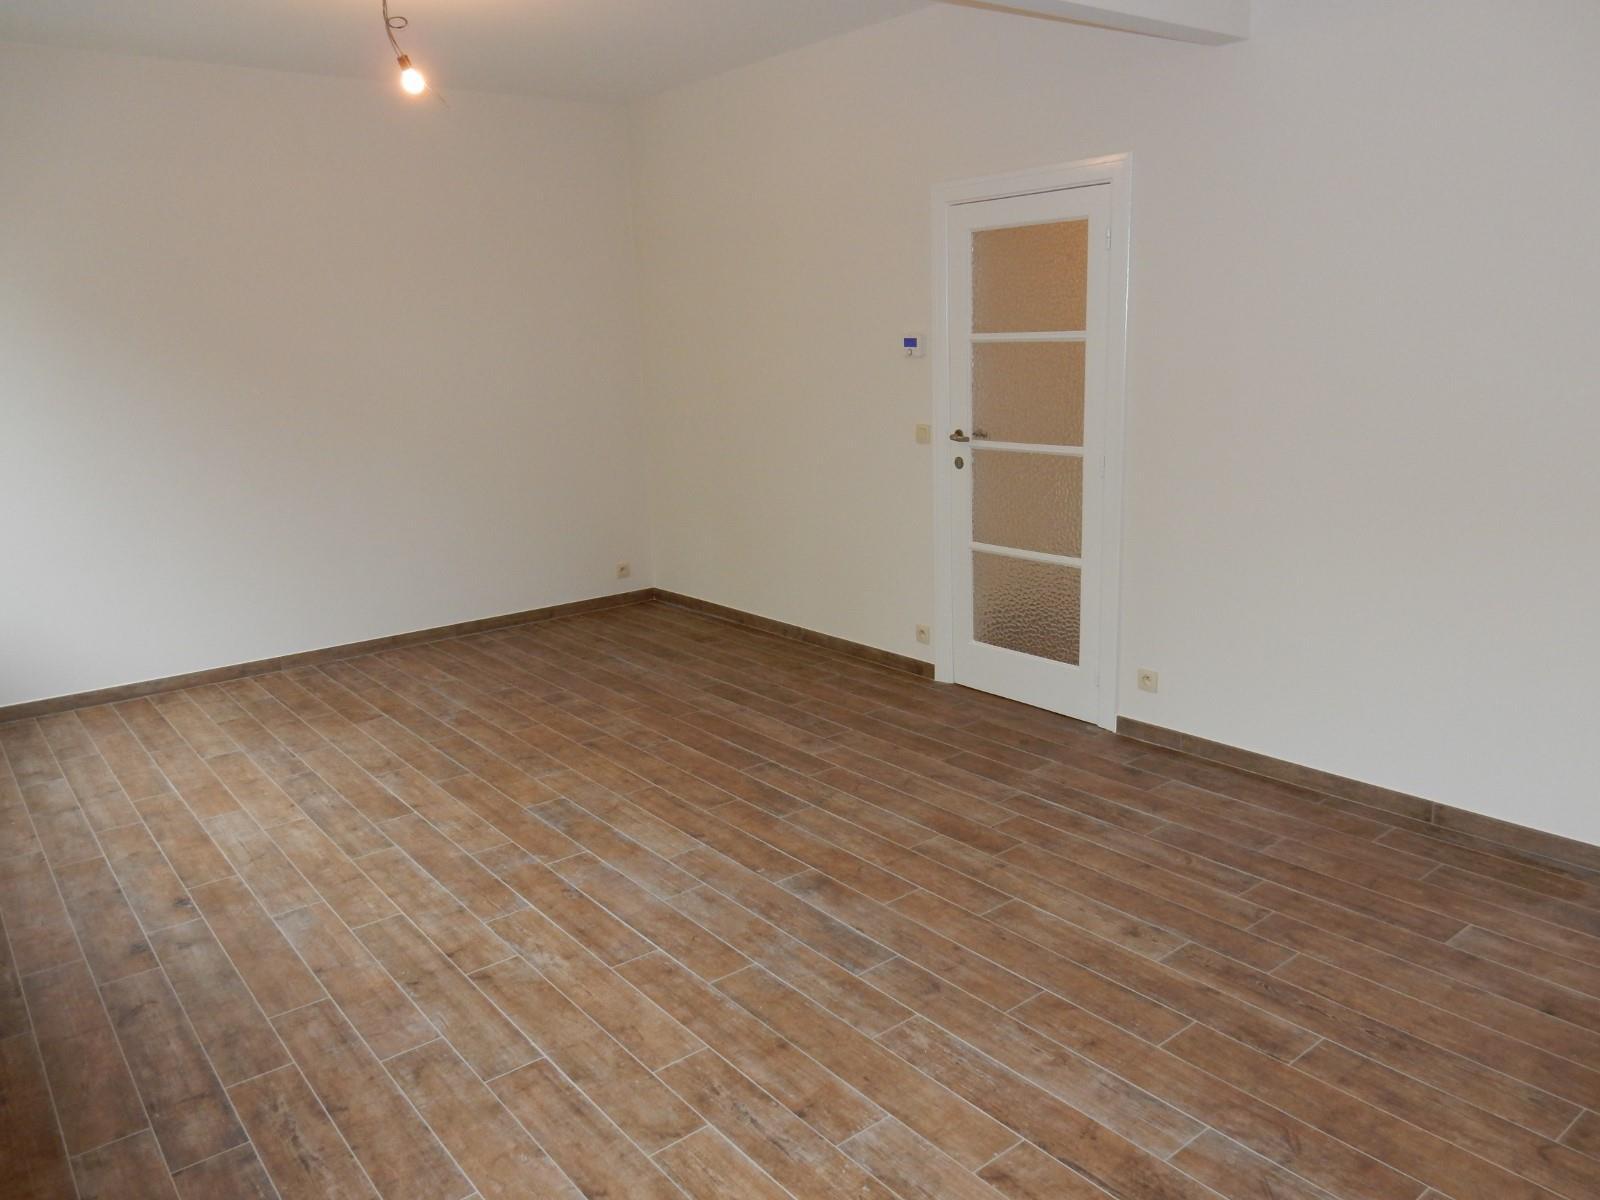 Appartement - Molenbeek-Saint-Jean - #3532282-1